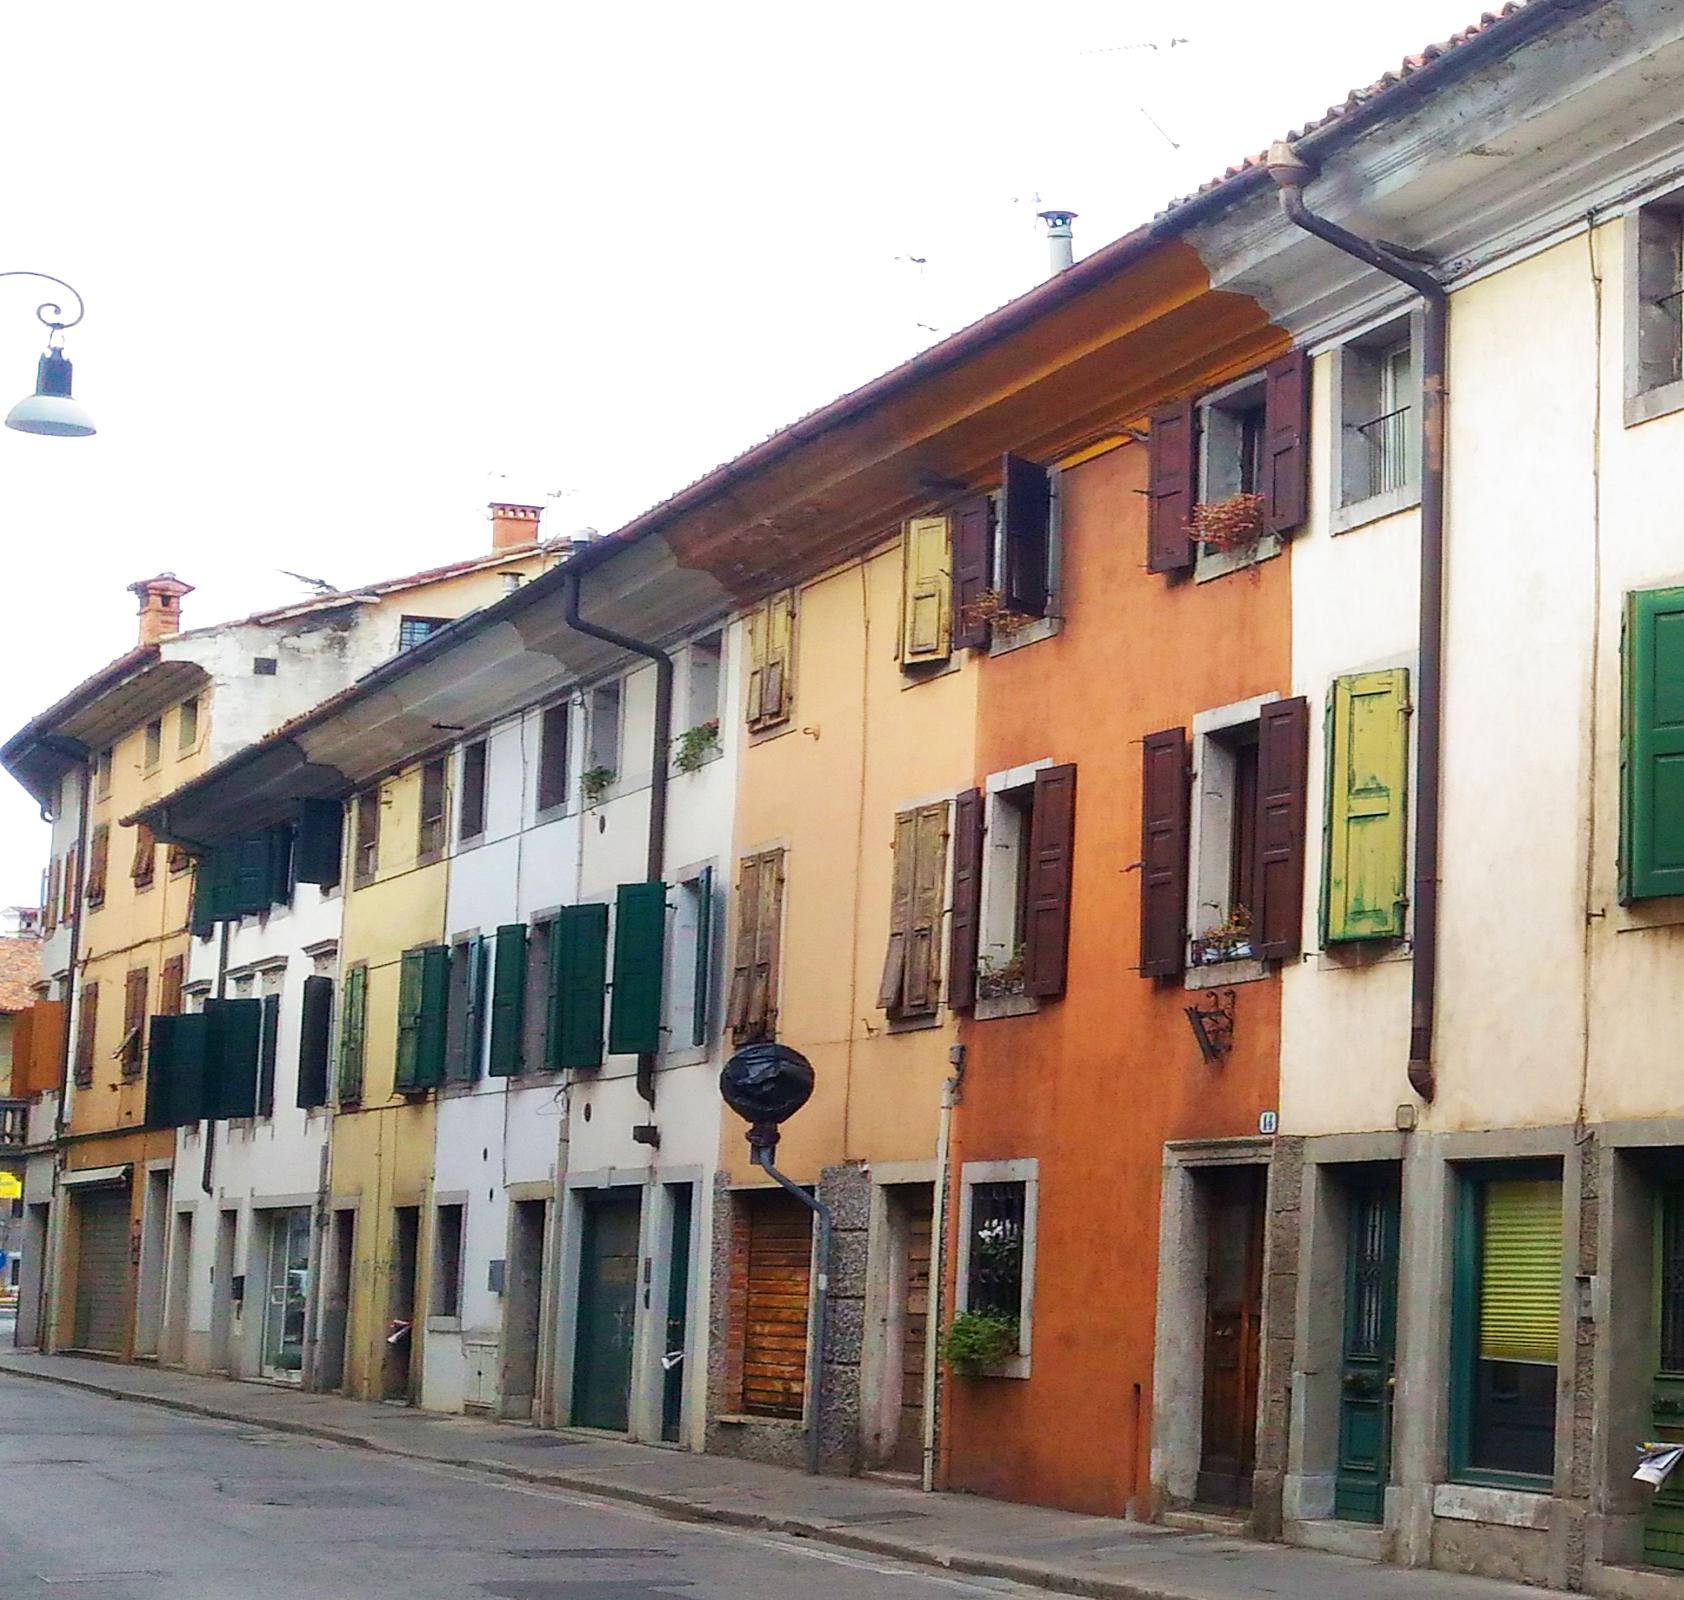 udine vendita quart: centro storico il cottage